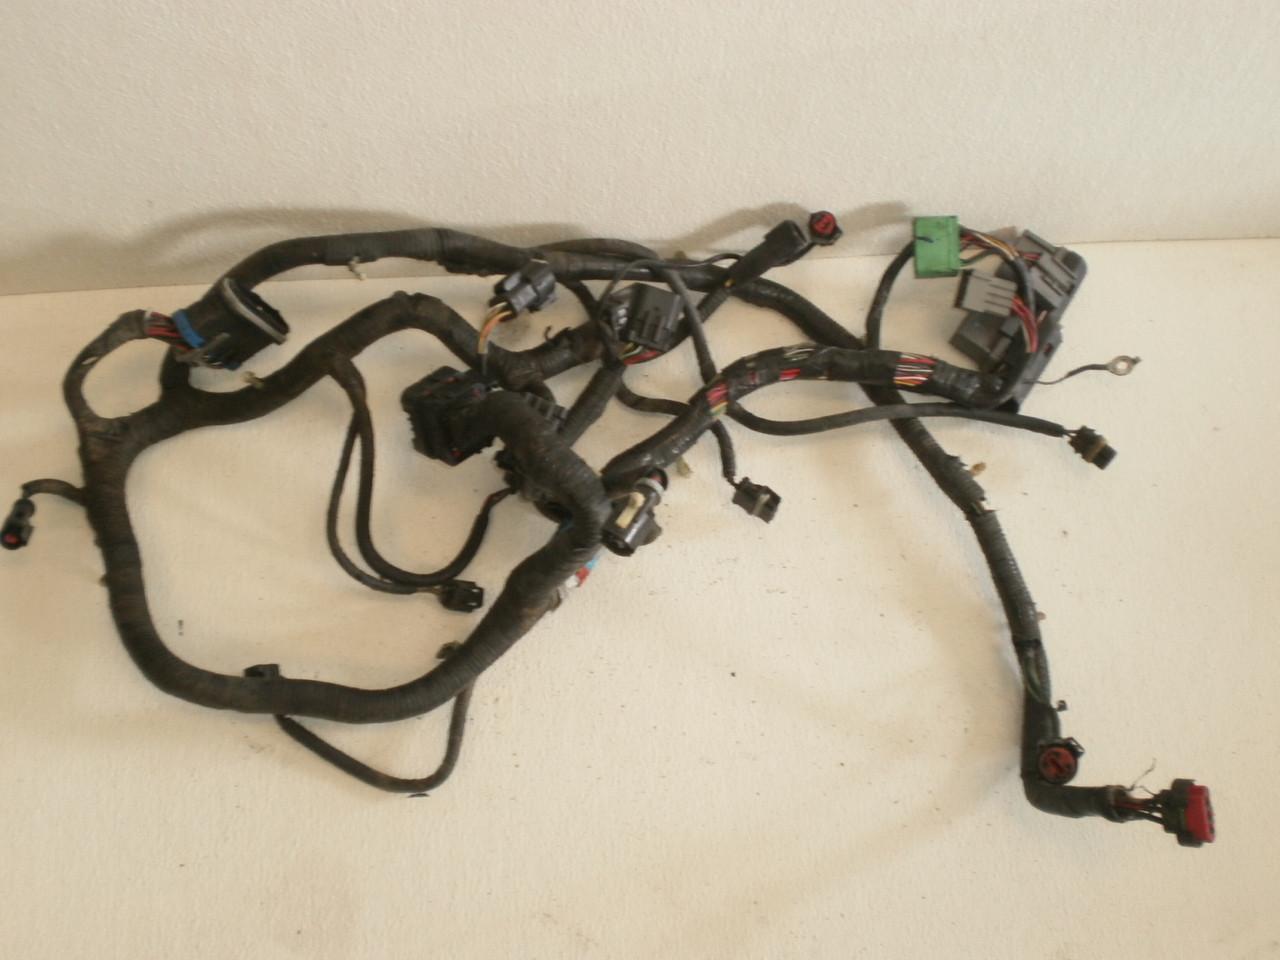 medium resolution of 2001 mustang alternator wiring harness wiring diagram schematics 2001 mustang gt engine wiring harness 01 mustang